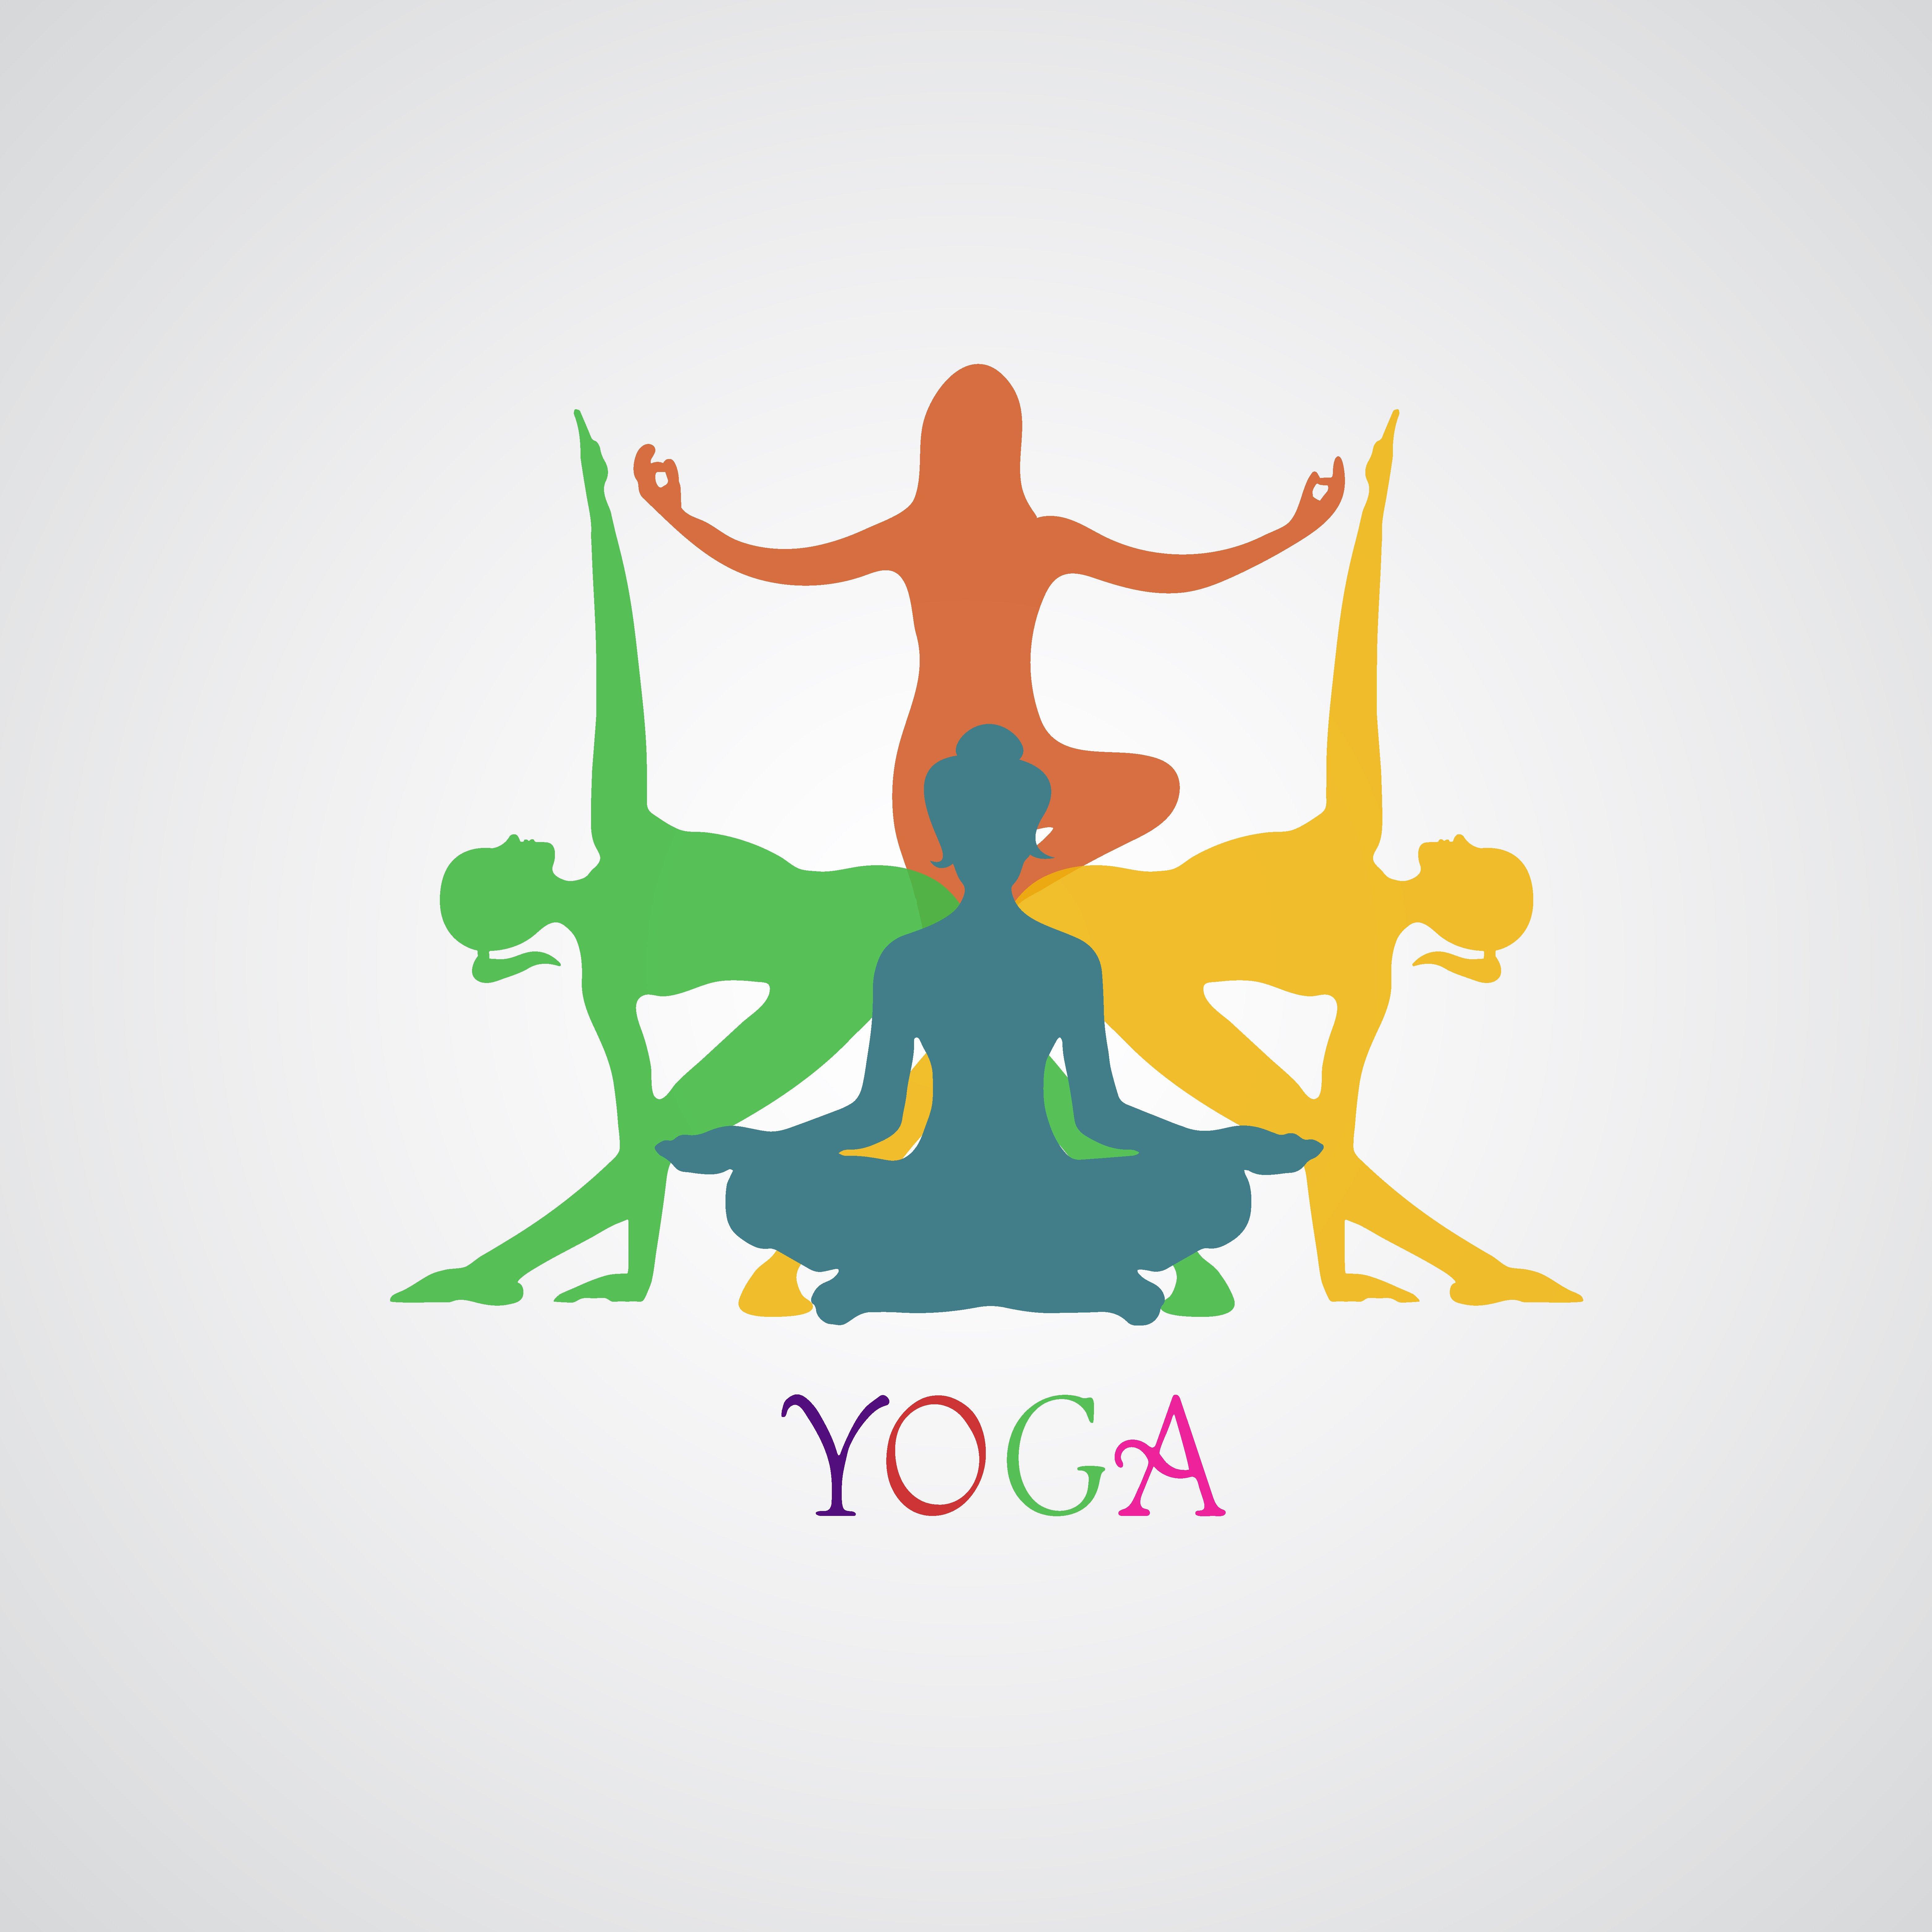 Yoga poses, woman, Pilates ~ Illustrations ~ Creative Market